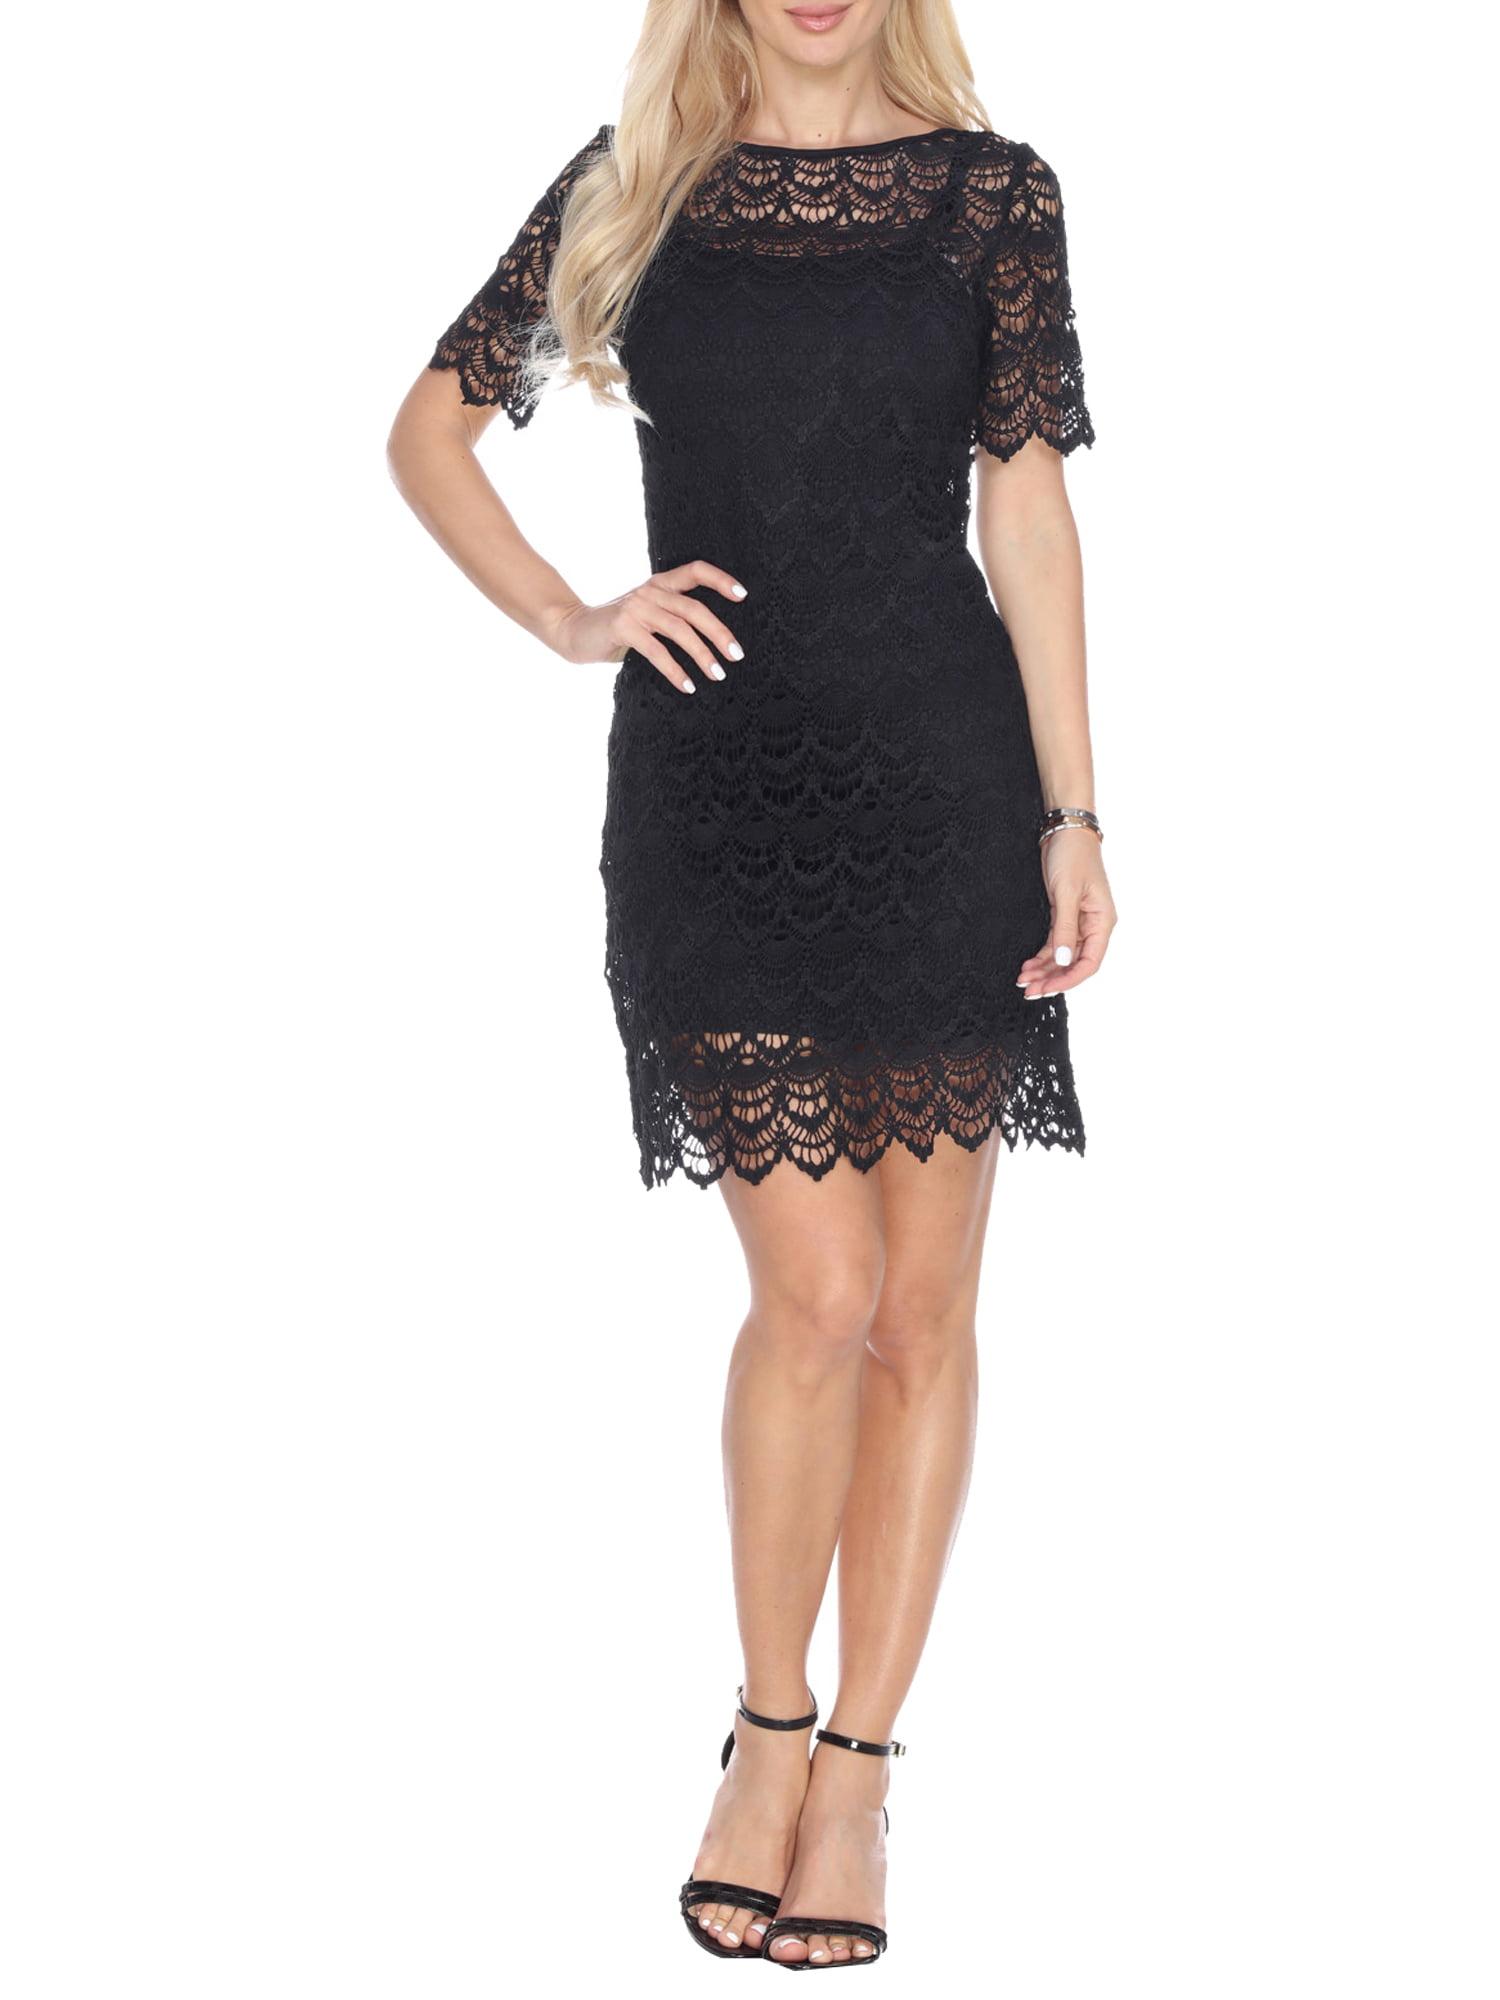 Women's Crochet Lace Overlay Mini Dress